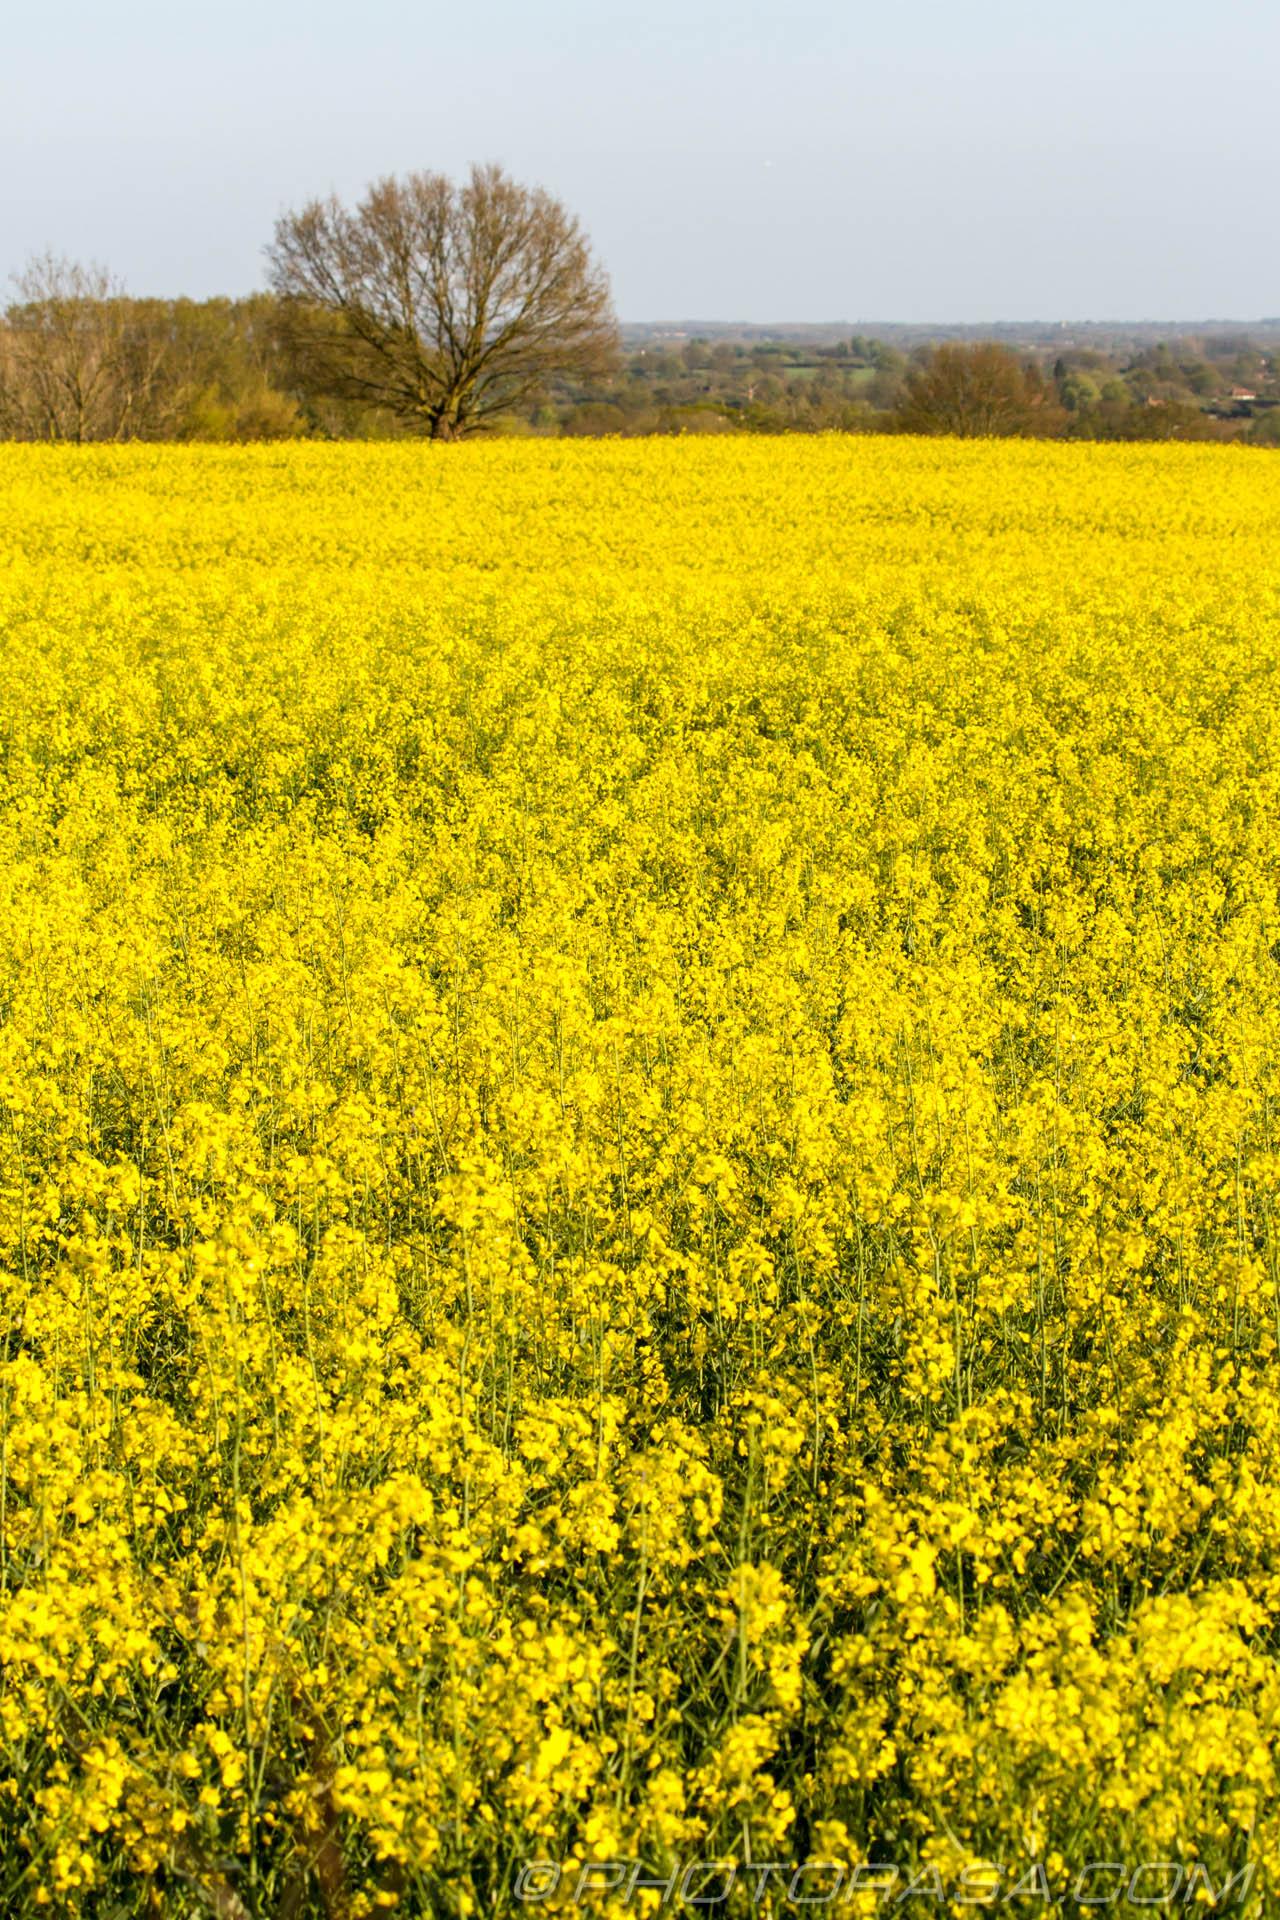 https://photorasa.com/farming/kentish-yellow-rapeseed-flowers/